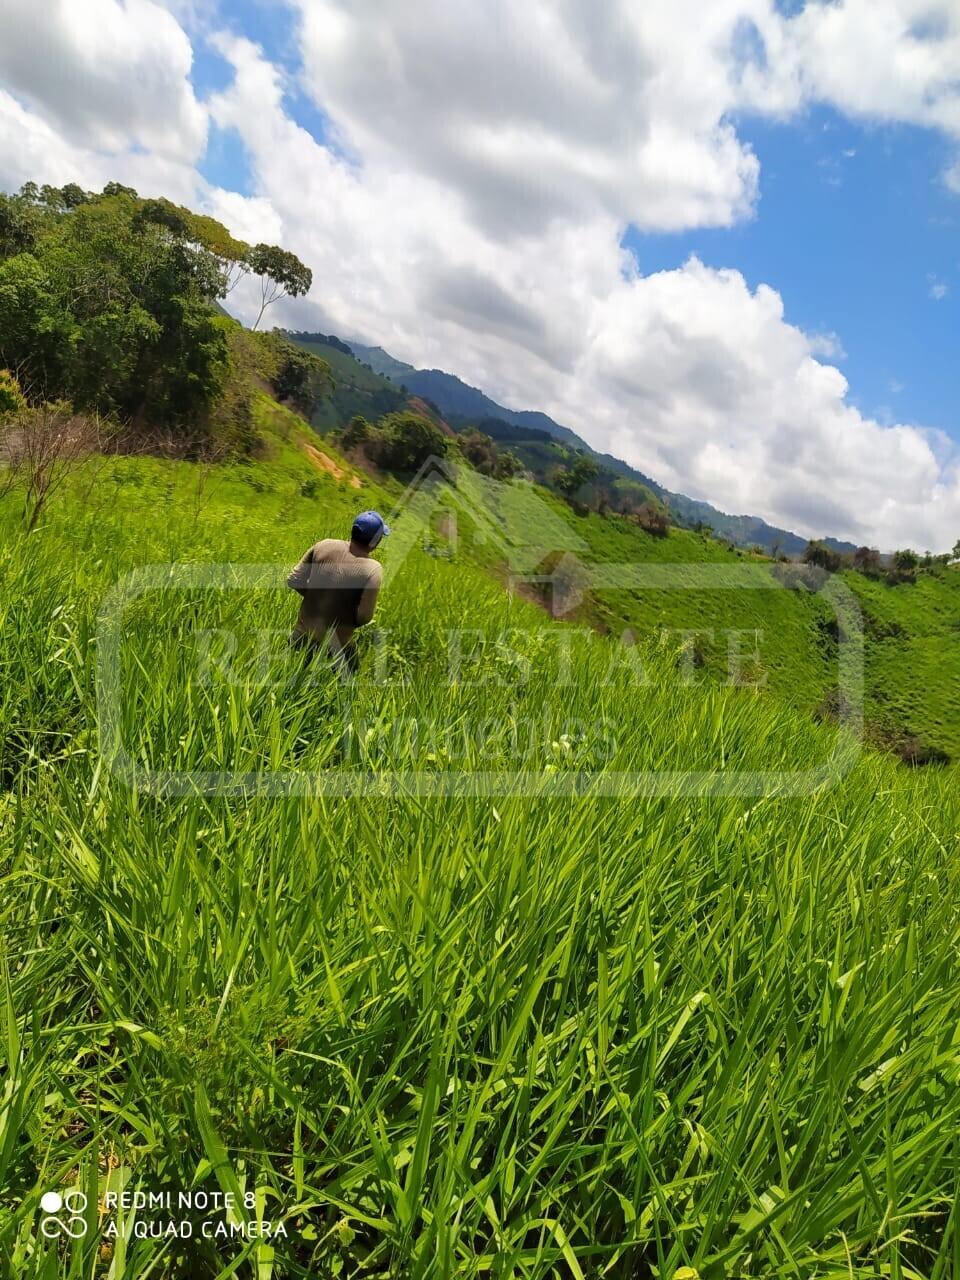 COD 201055   FINCA CUESTA RICA RIO NEGRO